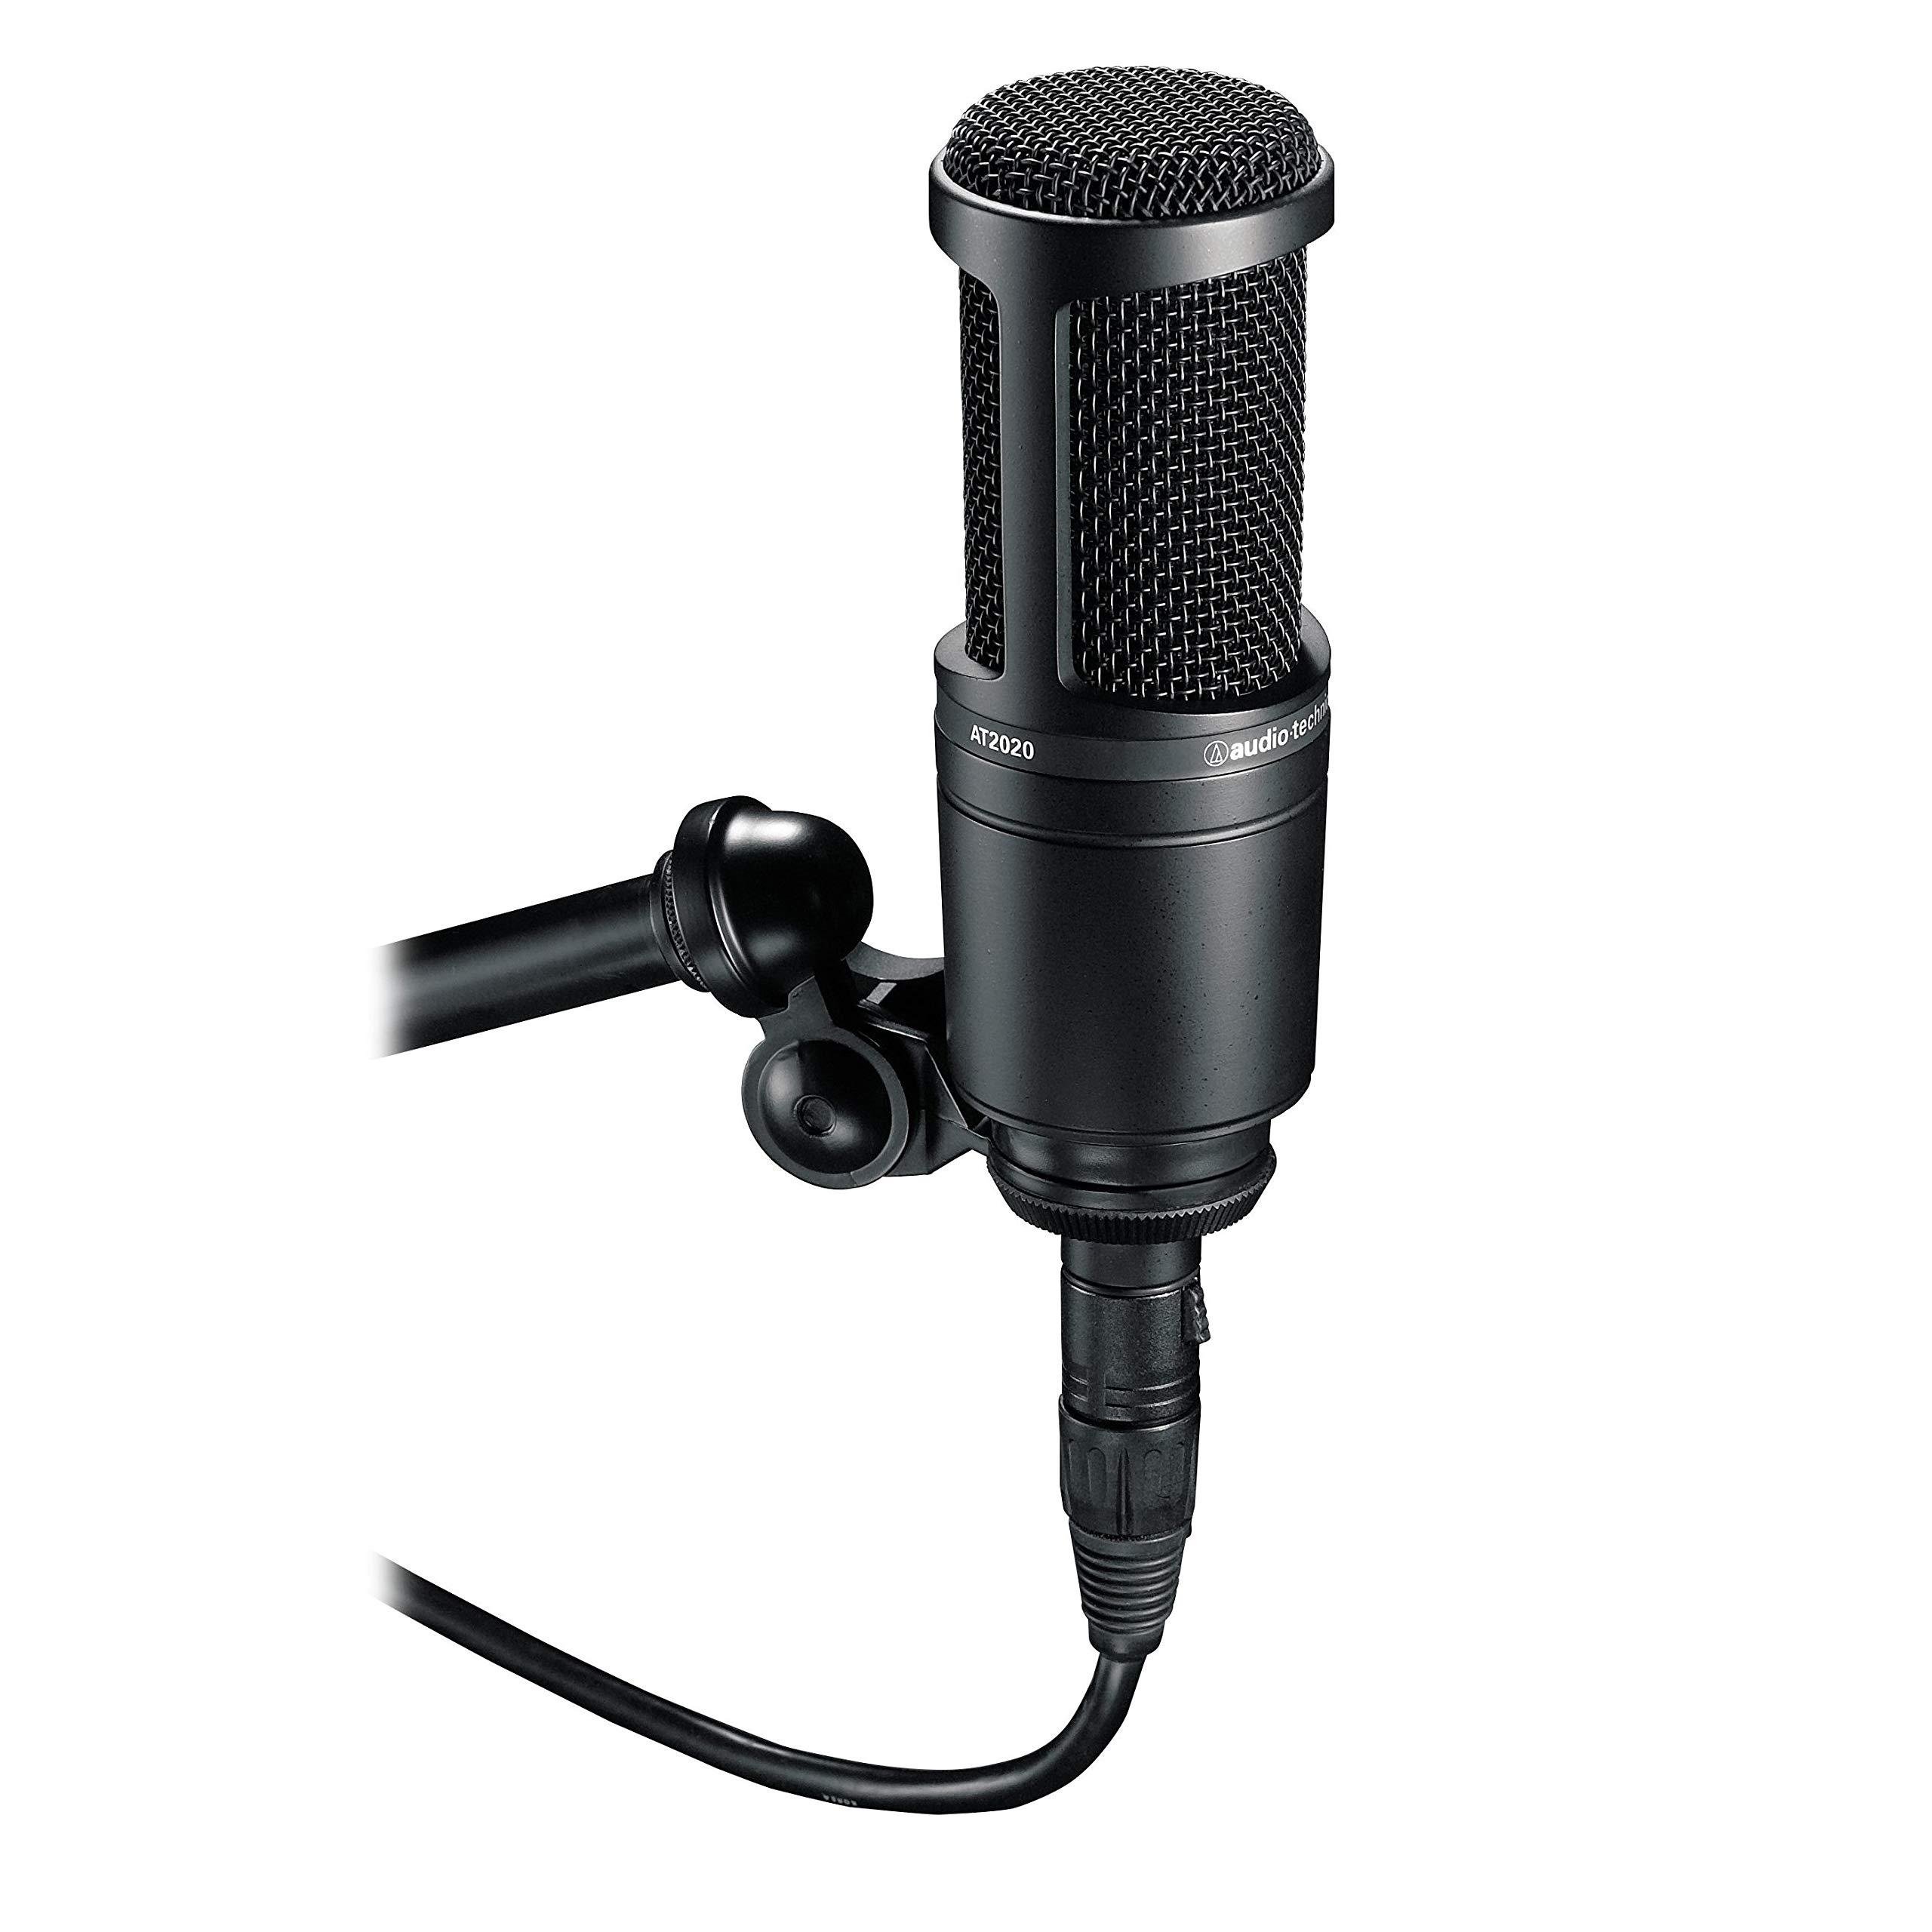 Audio-Technica AT2020 Cardioid Condenser Studio XLR Microphone, Black by Audio-Technica (Image #2)